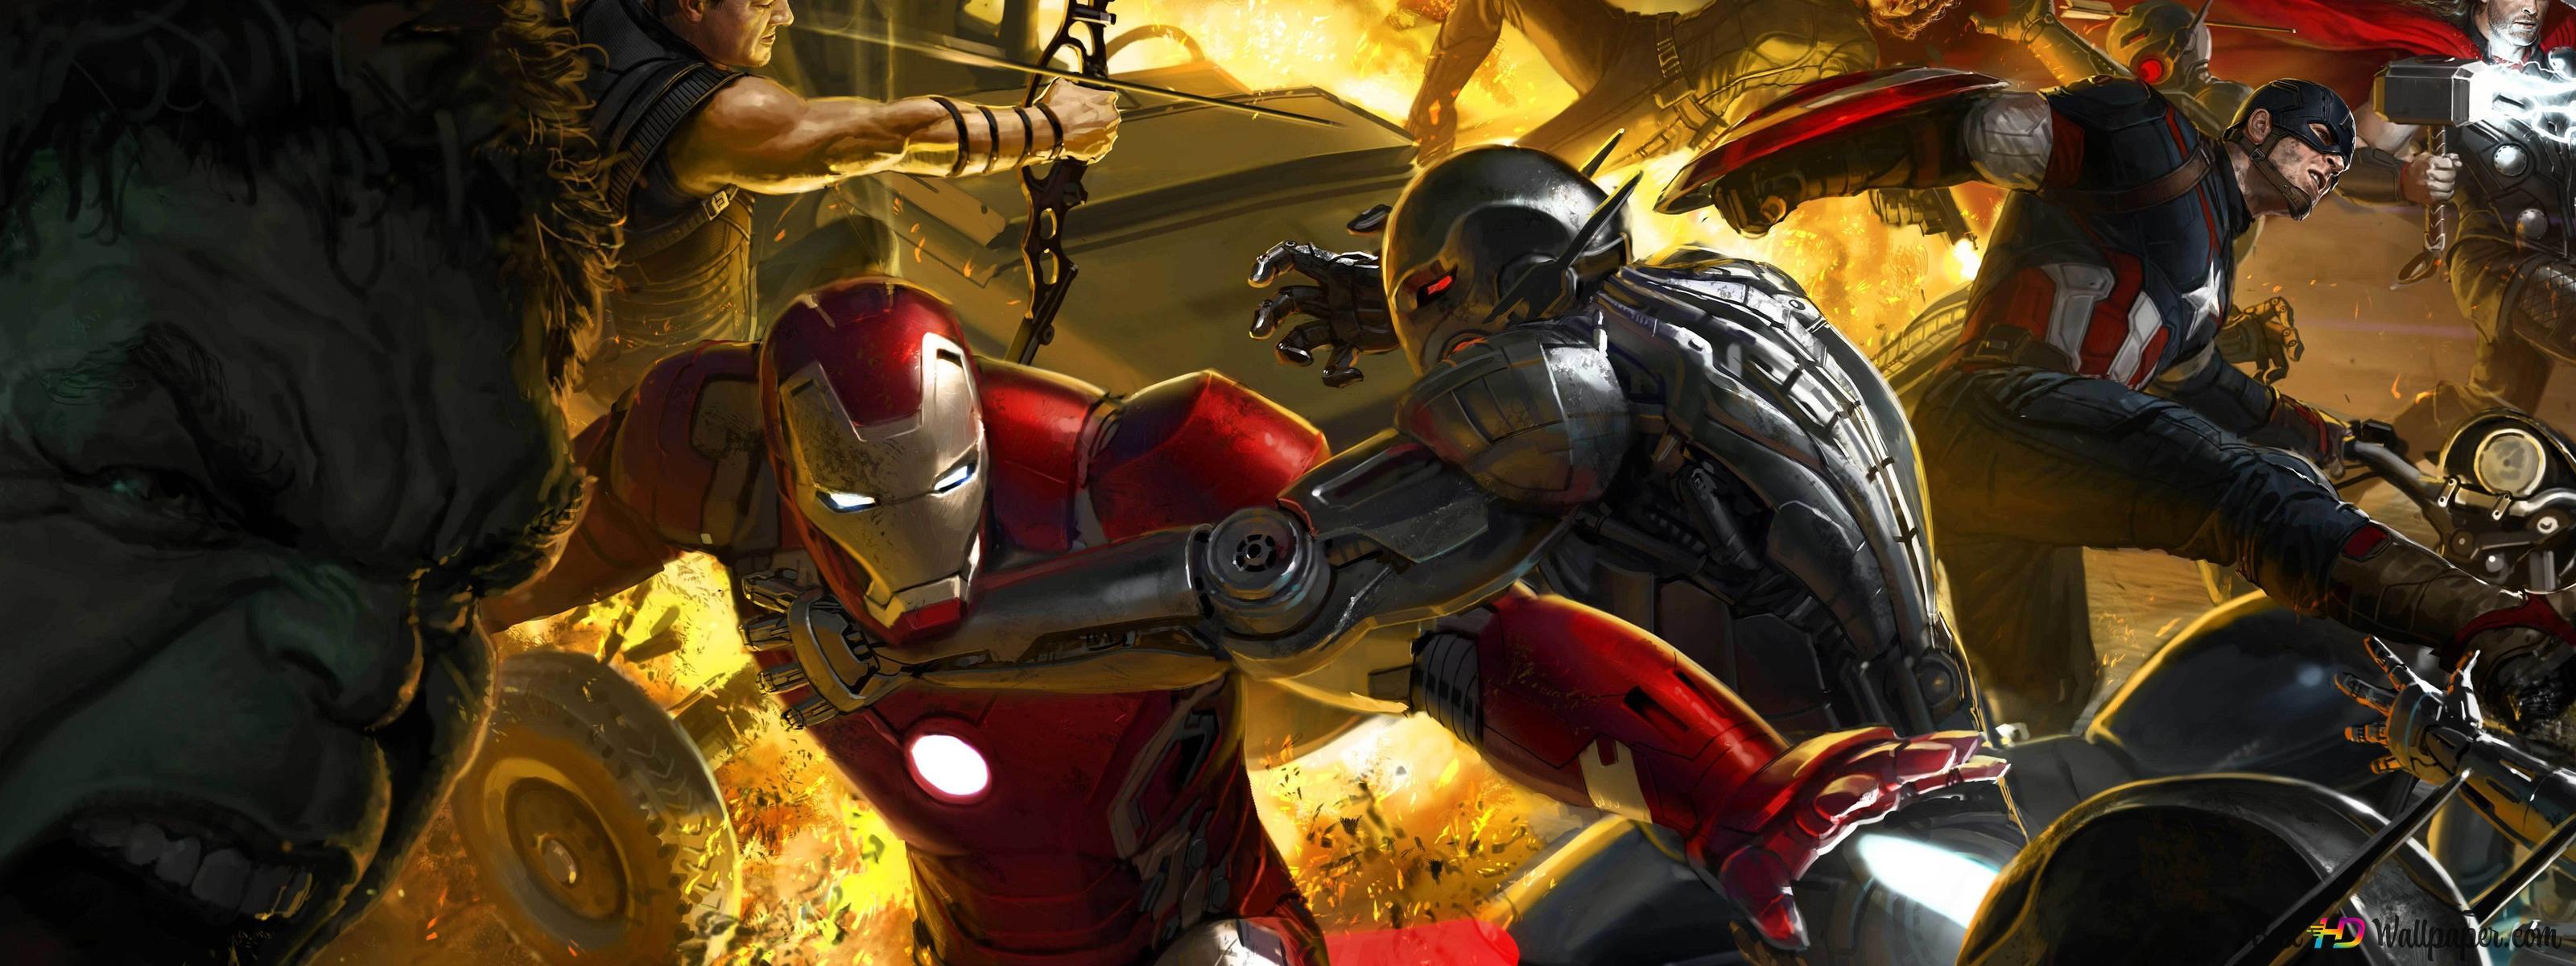 Avengers Infinity War Hd Wallpaper Download